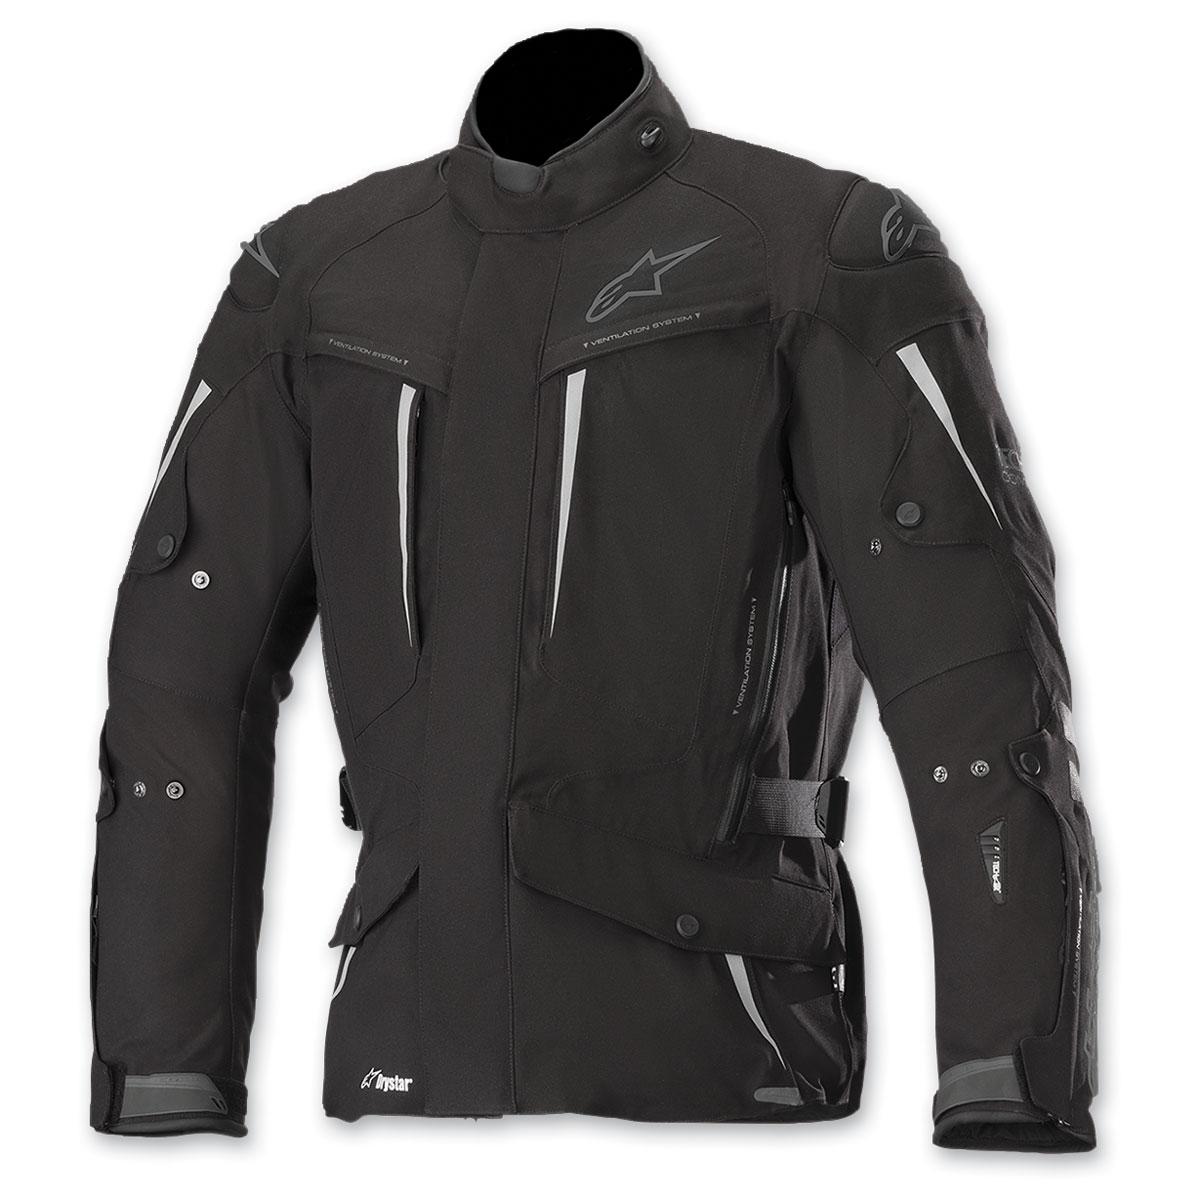 Alpinestars Men's Tech Air Street Compatible Yaguara Black/Anthracite Jacket